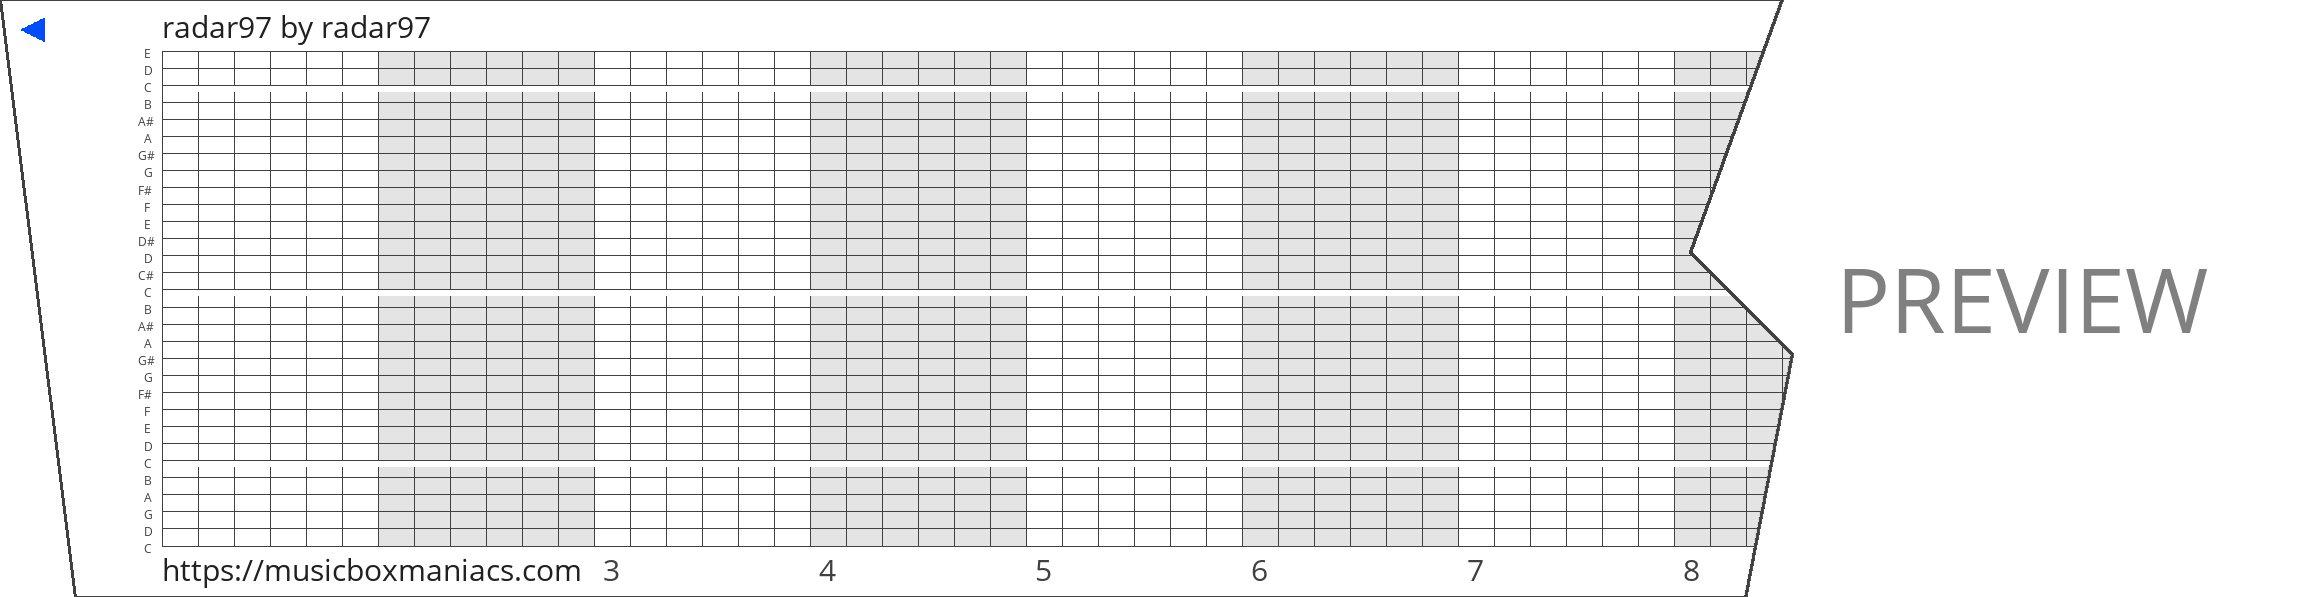 radar97 30 note music box paper strip